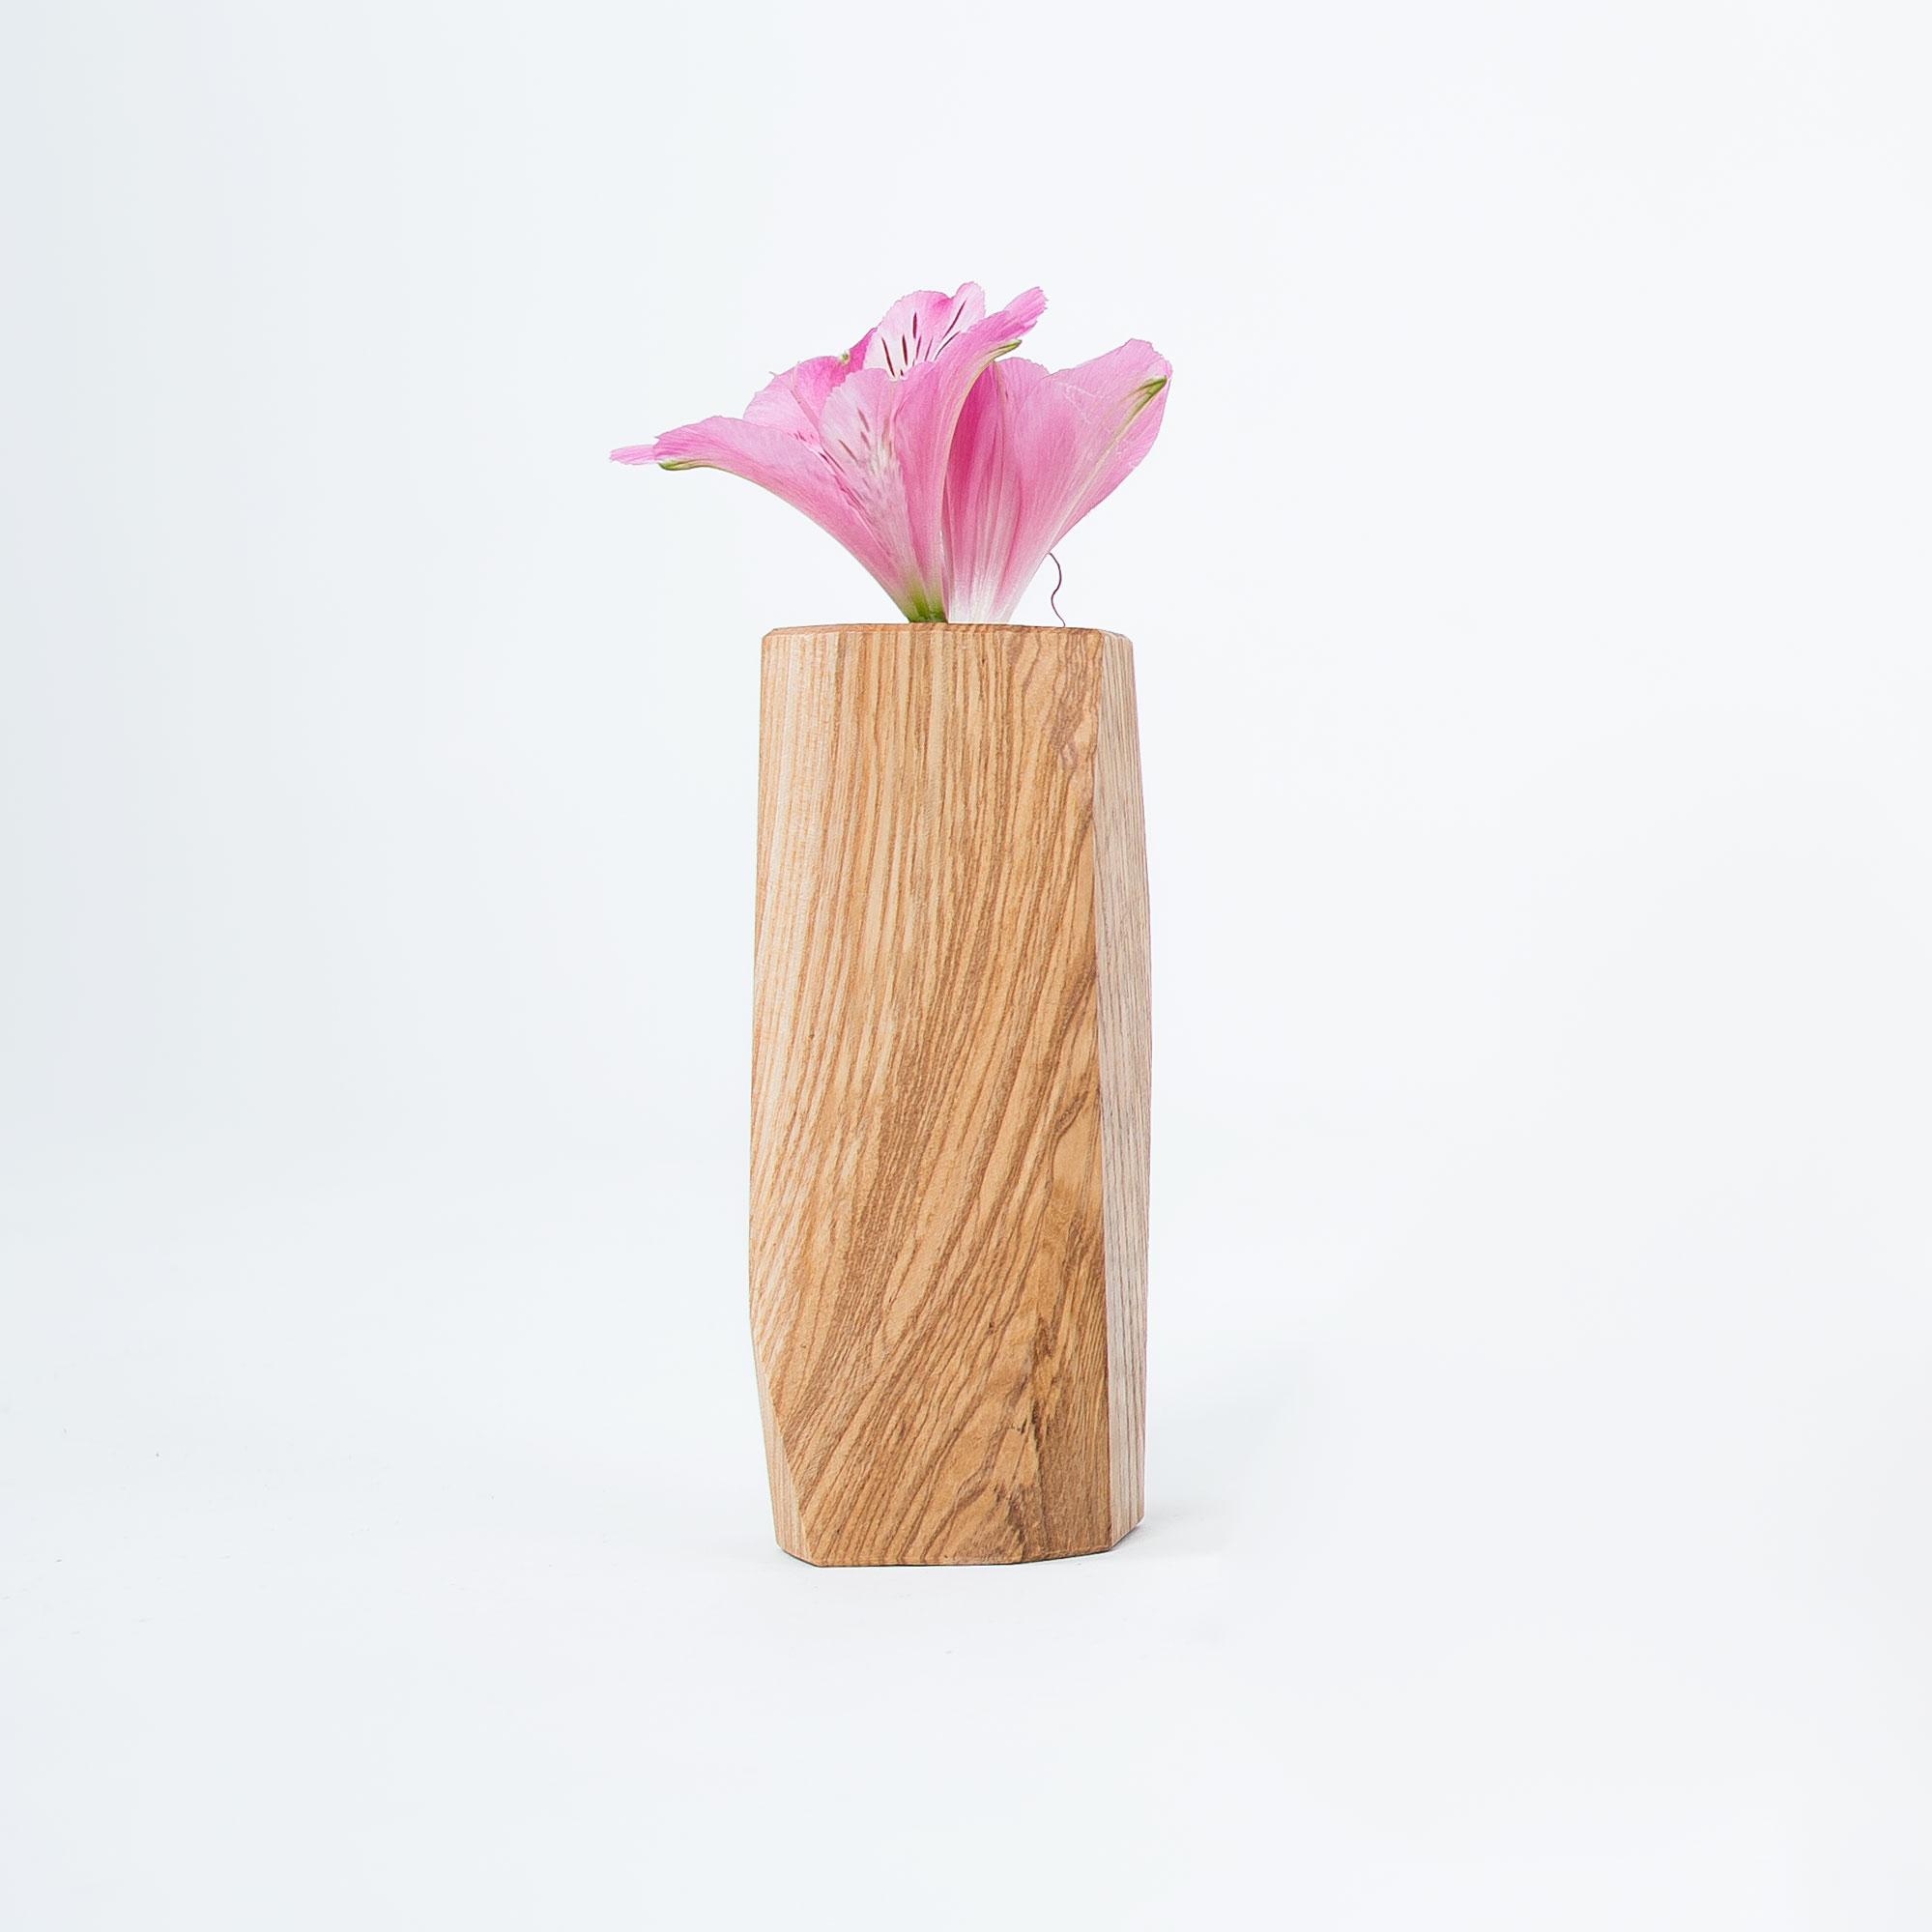 Olive Ash wooden vase. /  Florero de madera de fresno oliva.